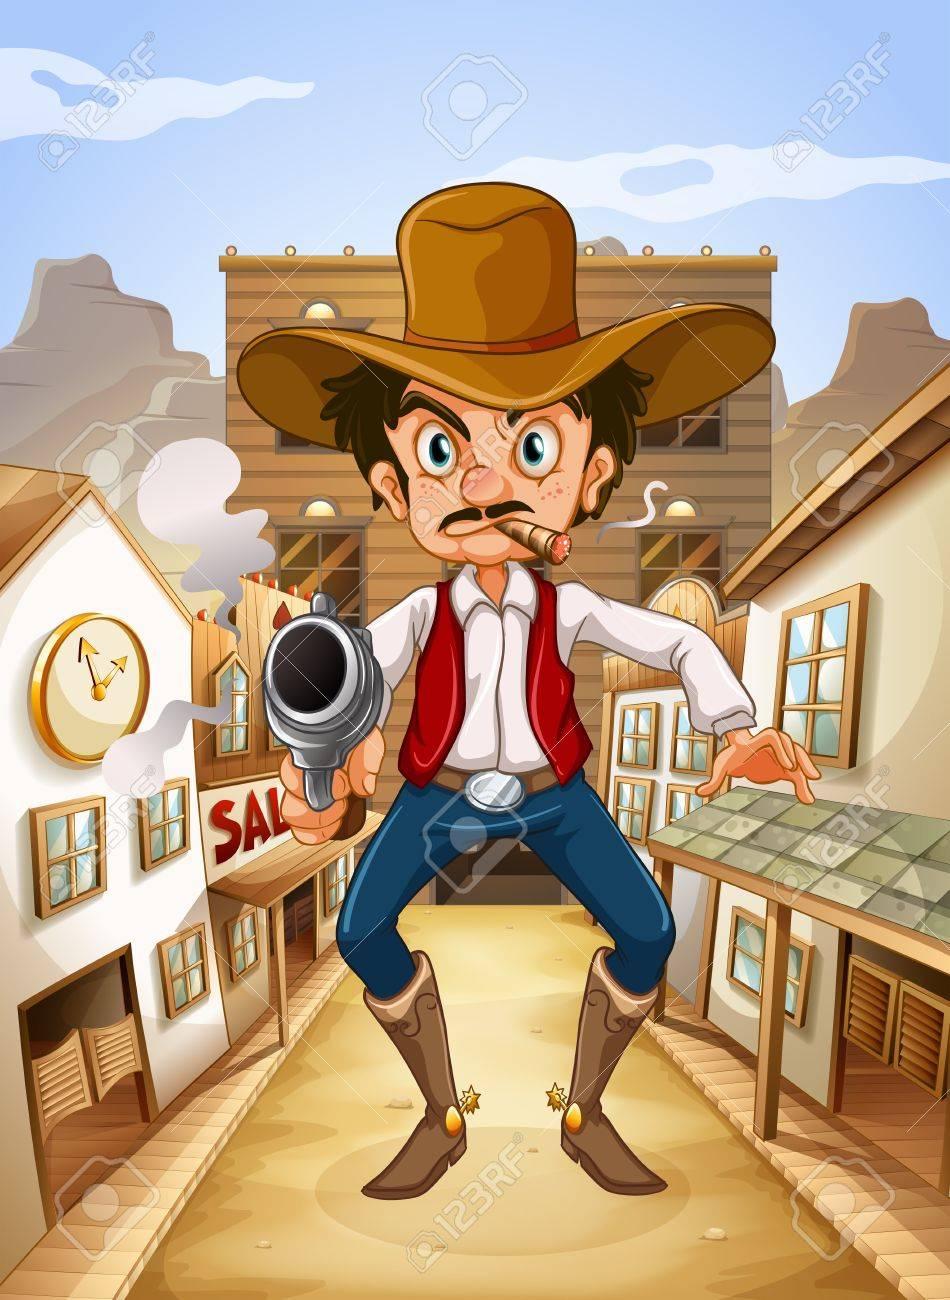 Illustration of a Mexican man holding a gun Stock Vector - 18983692